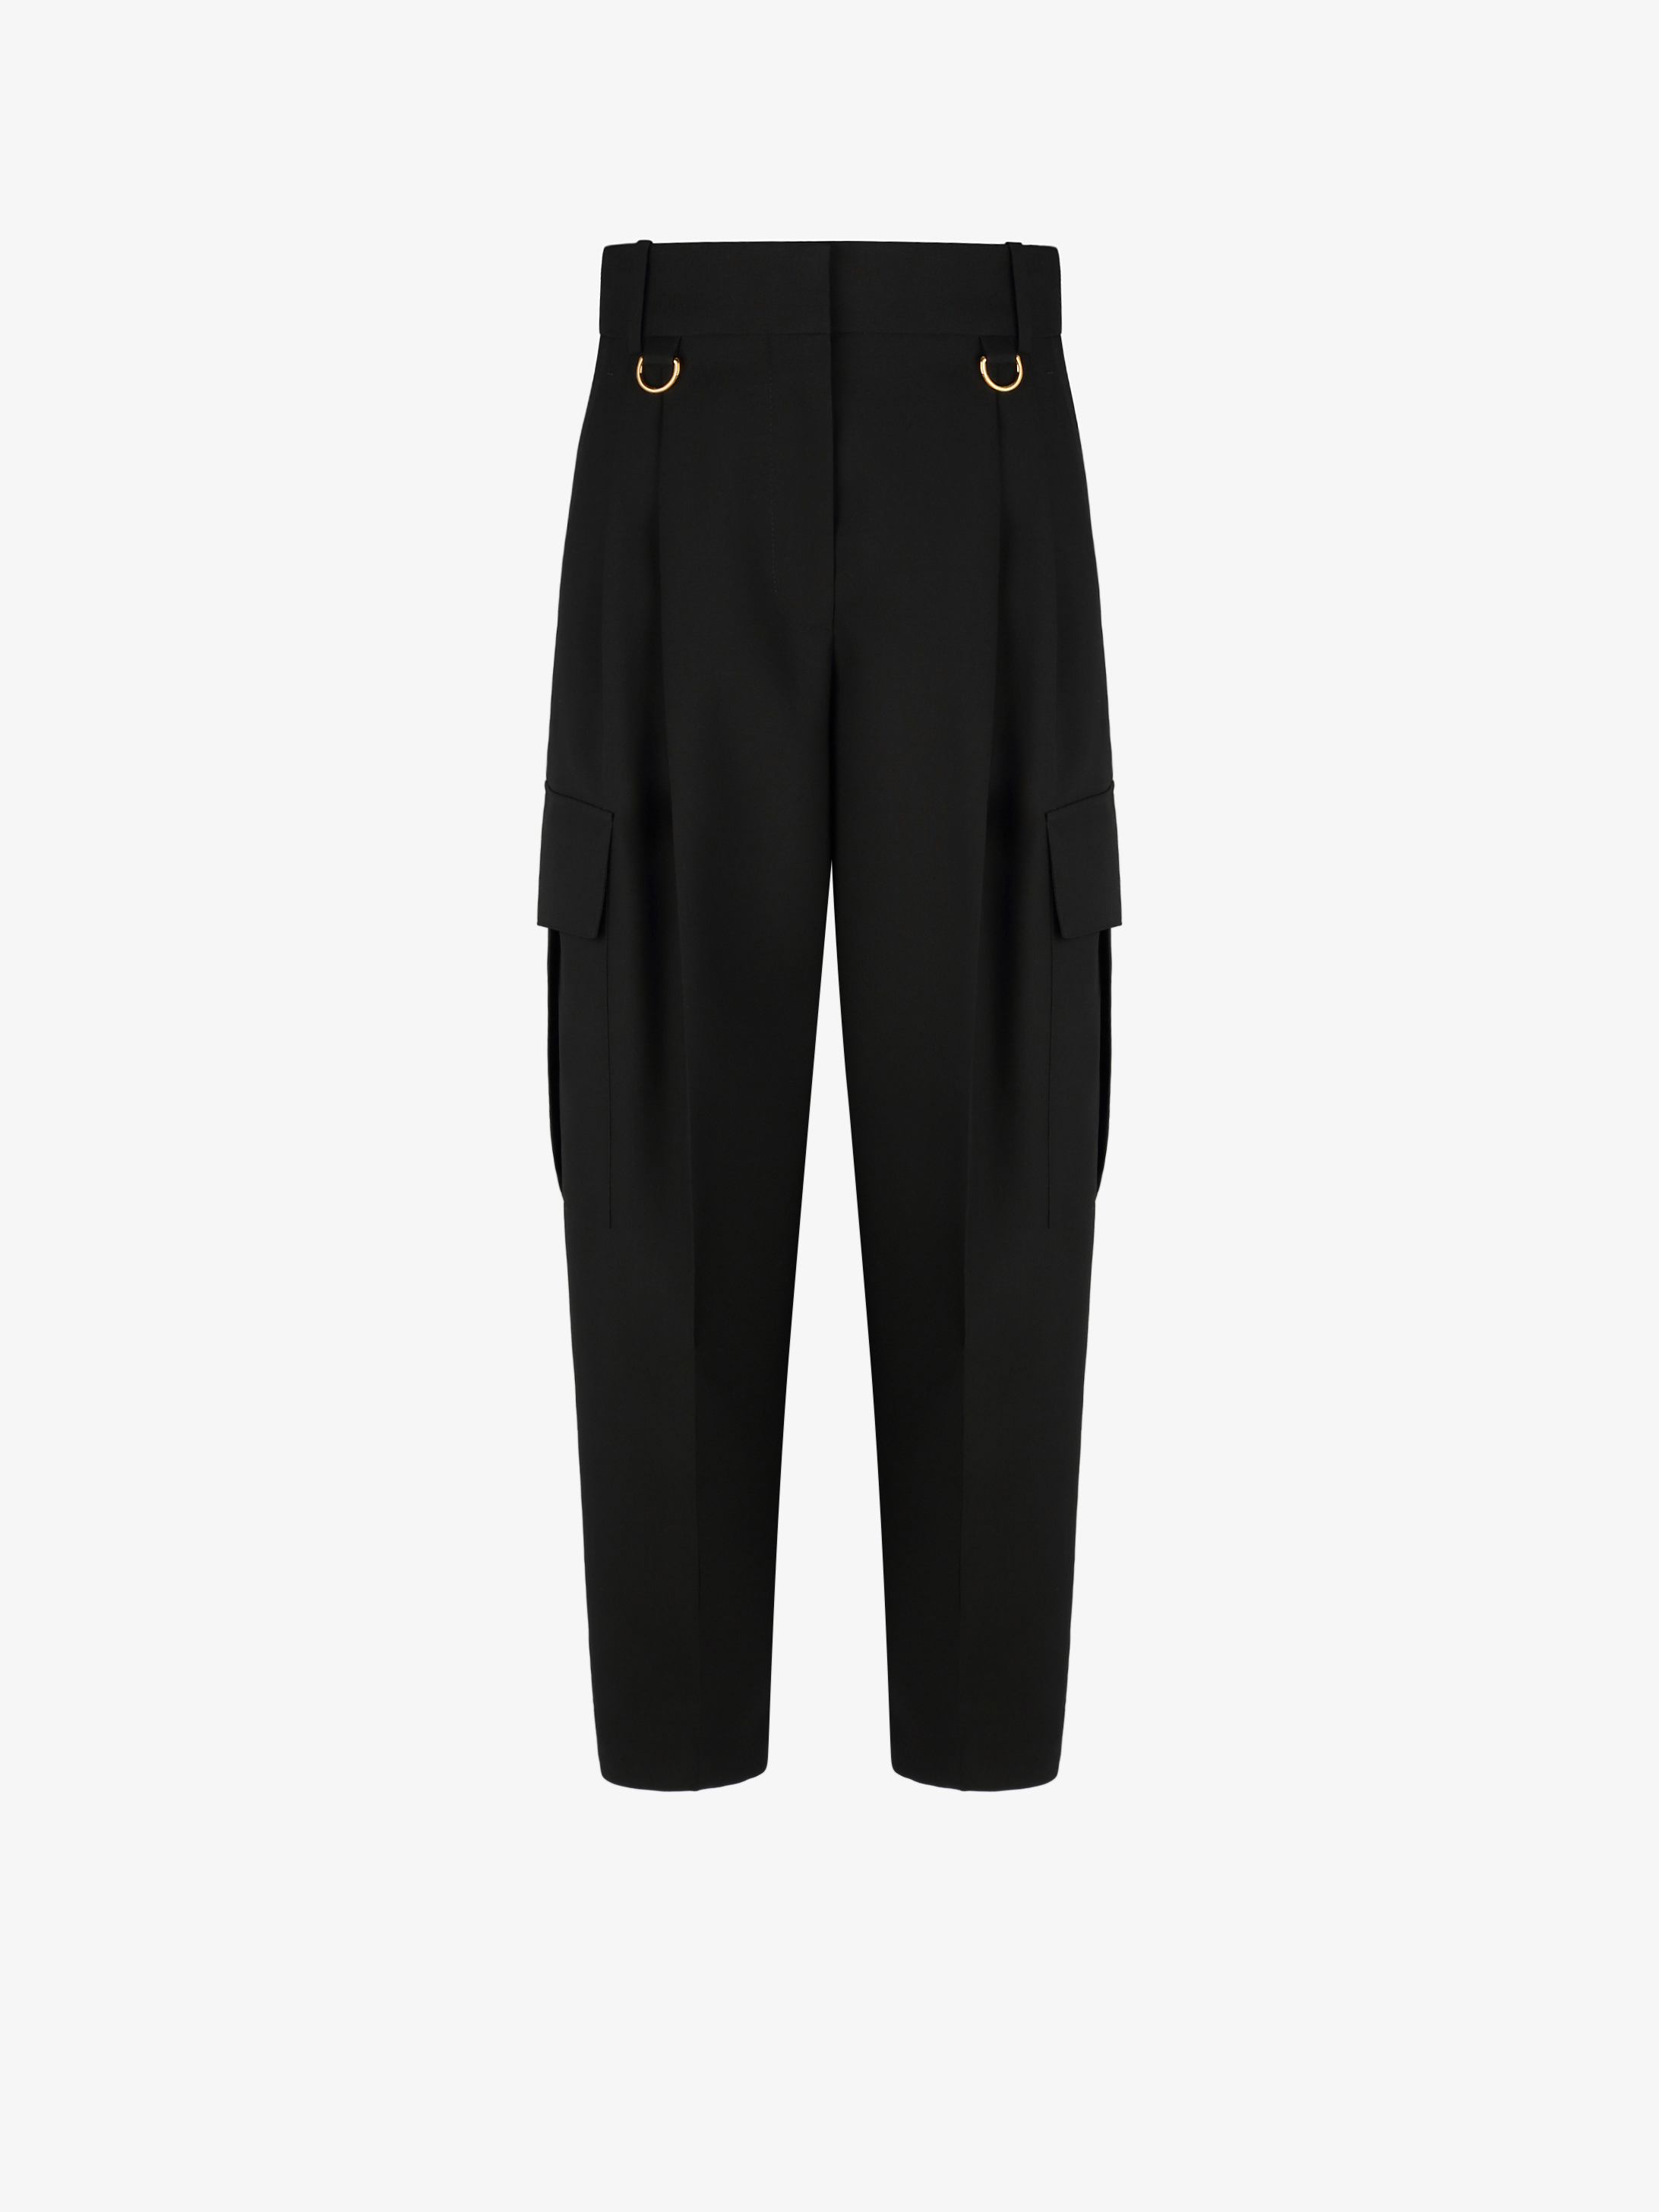 Cargo pants in lightweight wool with metallic details